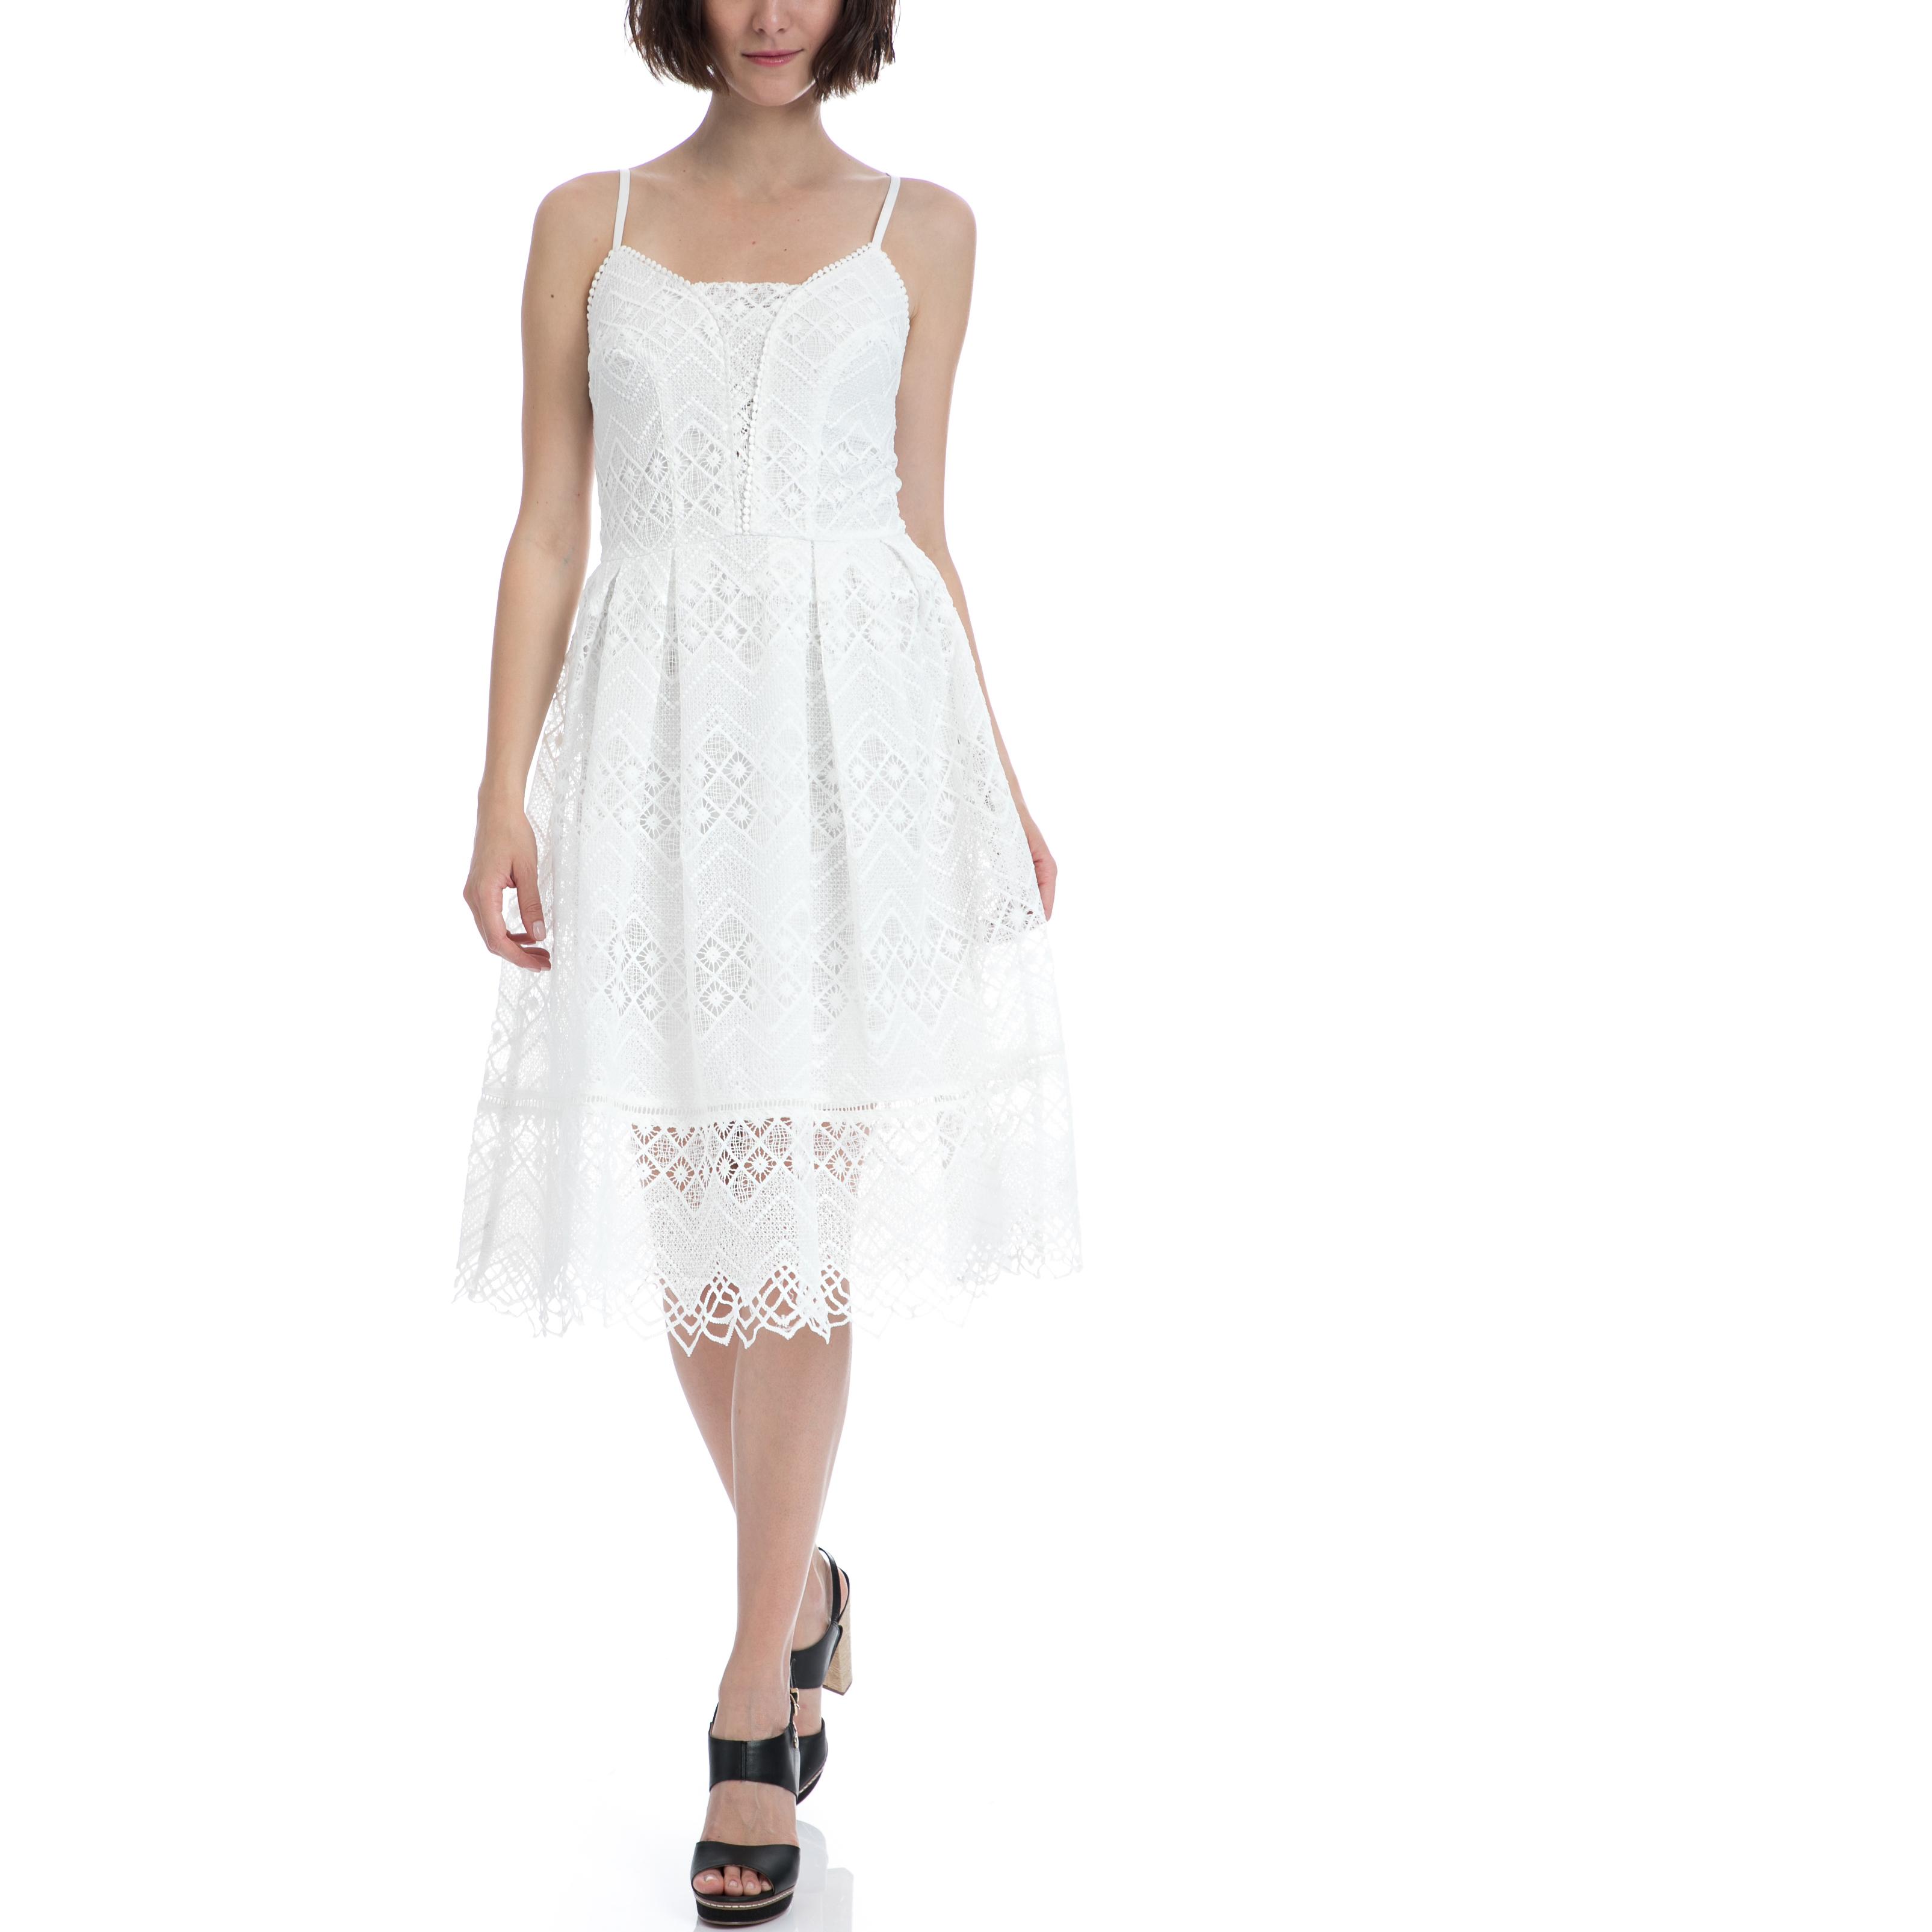 GARCIA JEANS - Γυναικείο φόρεμα Garcia Jeans λευκό γυναικεία ρούχα φορέματα μέχρι το γόνατο